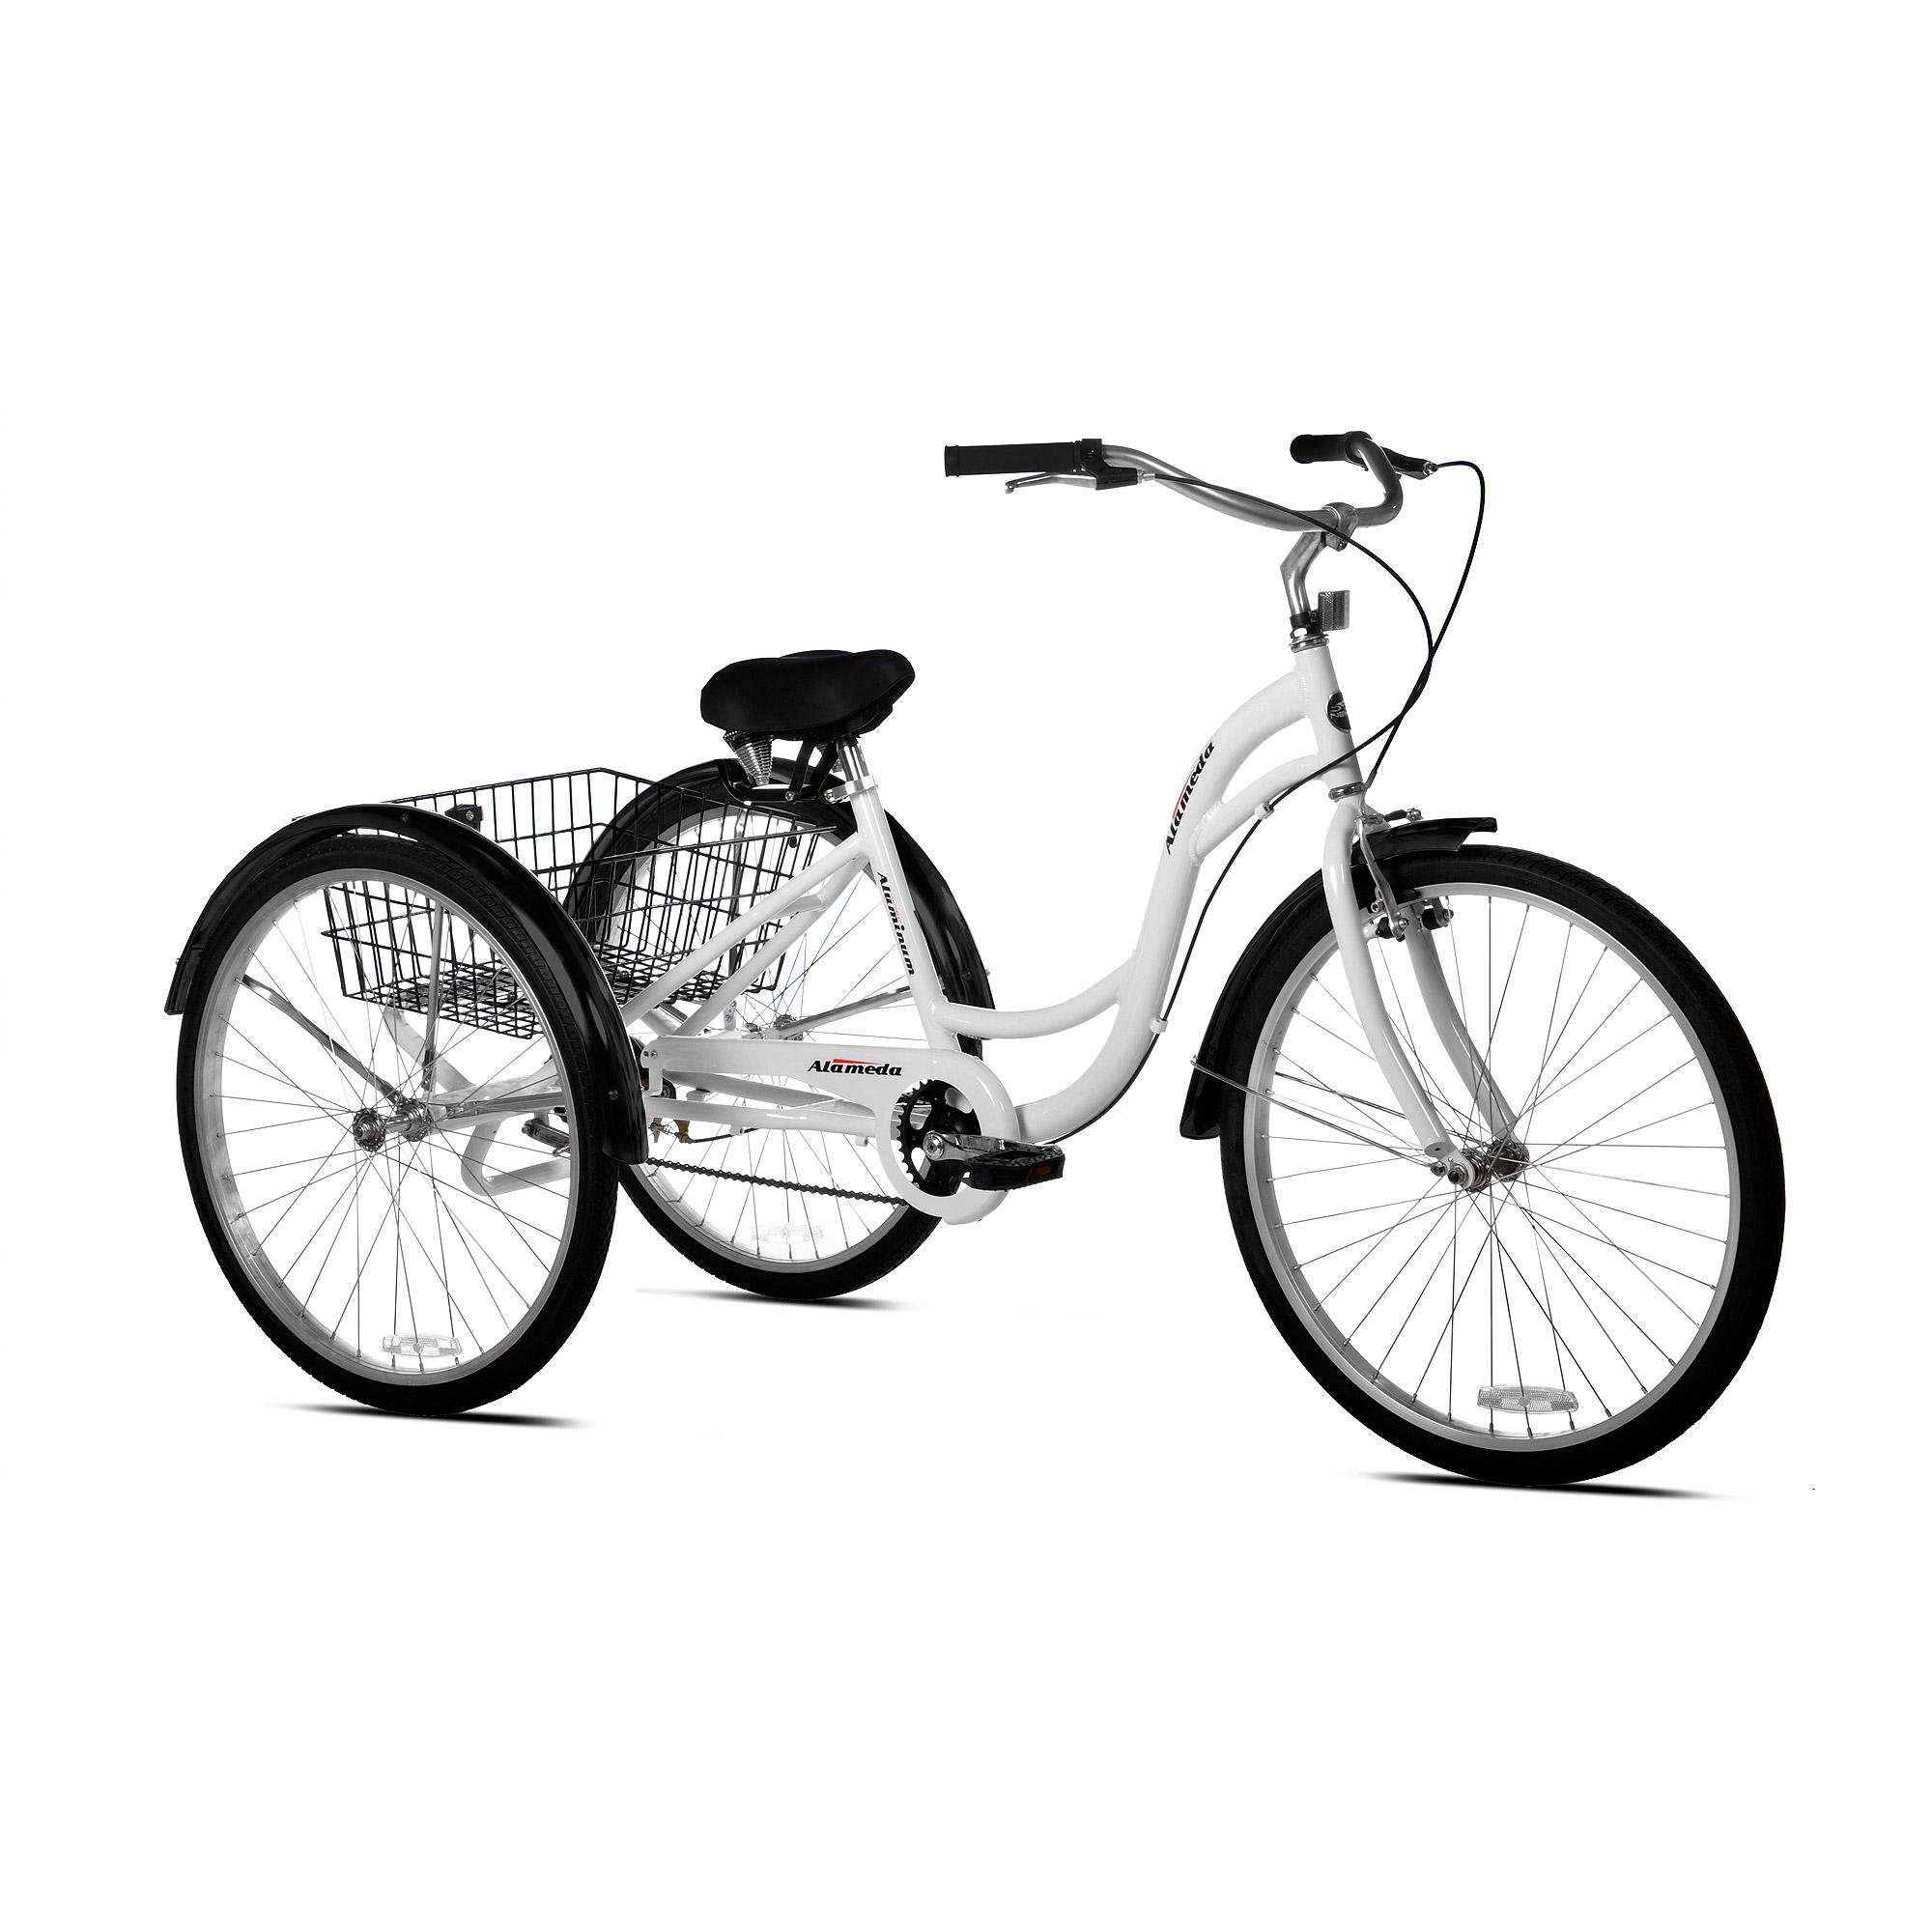 Gasoline Powered Gas Motor Kit For Kent Adult 3 Wheel